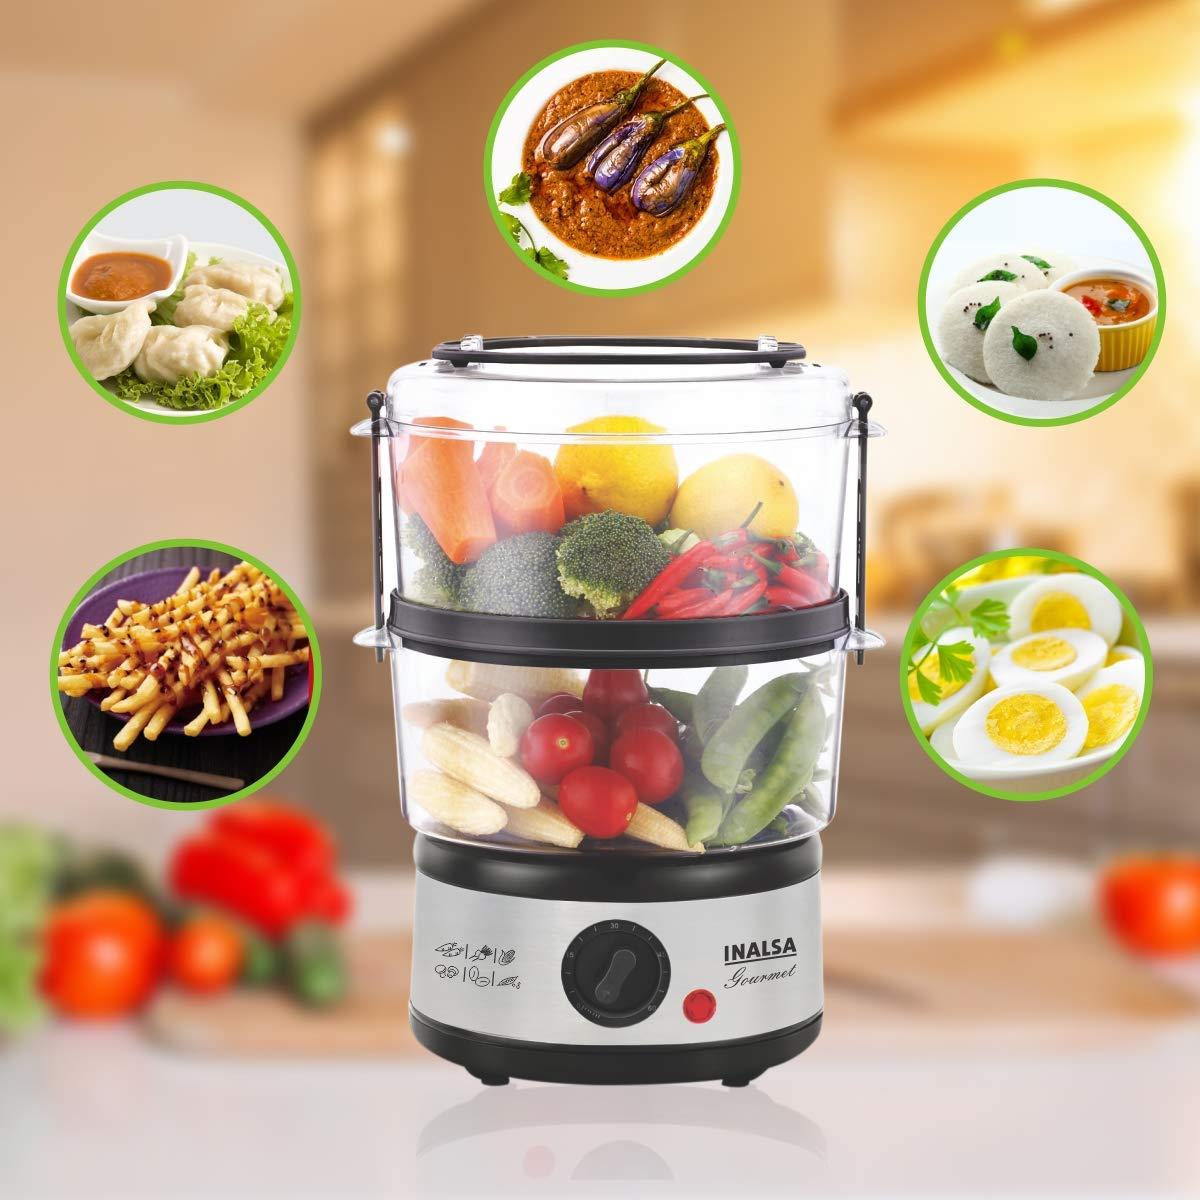 Achetez Inalsa 5L Gourmet Multi-Function 500W-Food Steamer & Egg ...